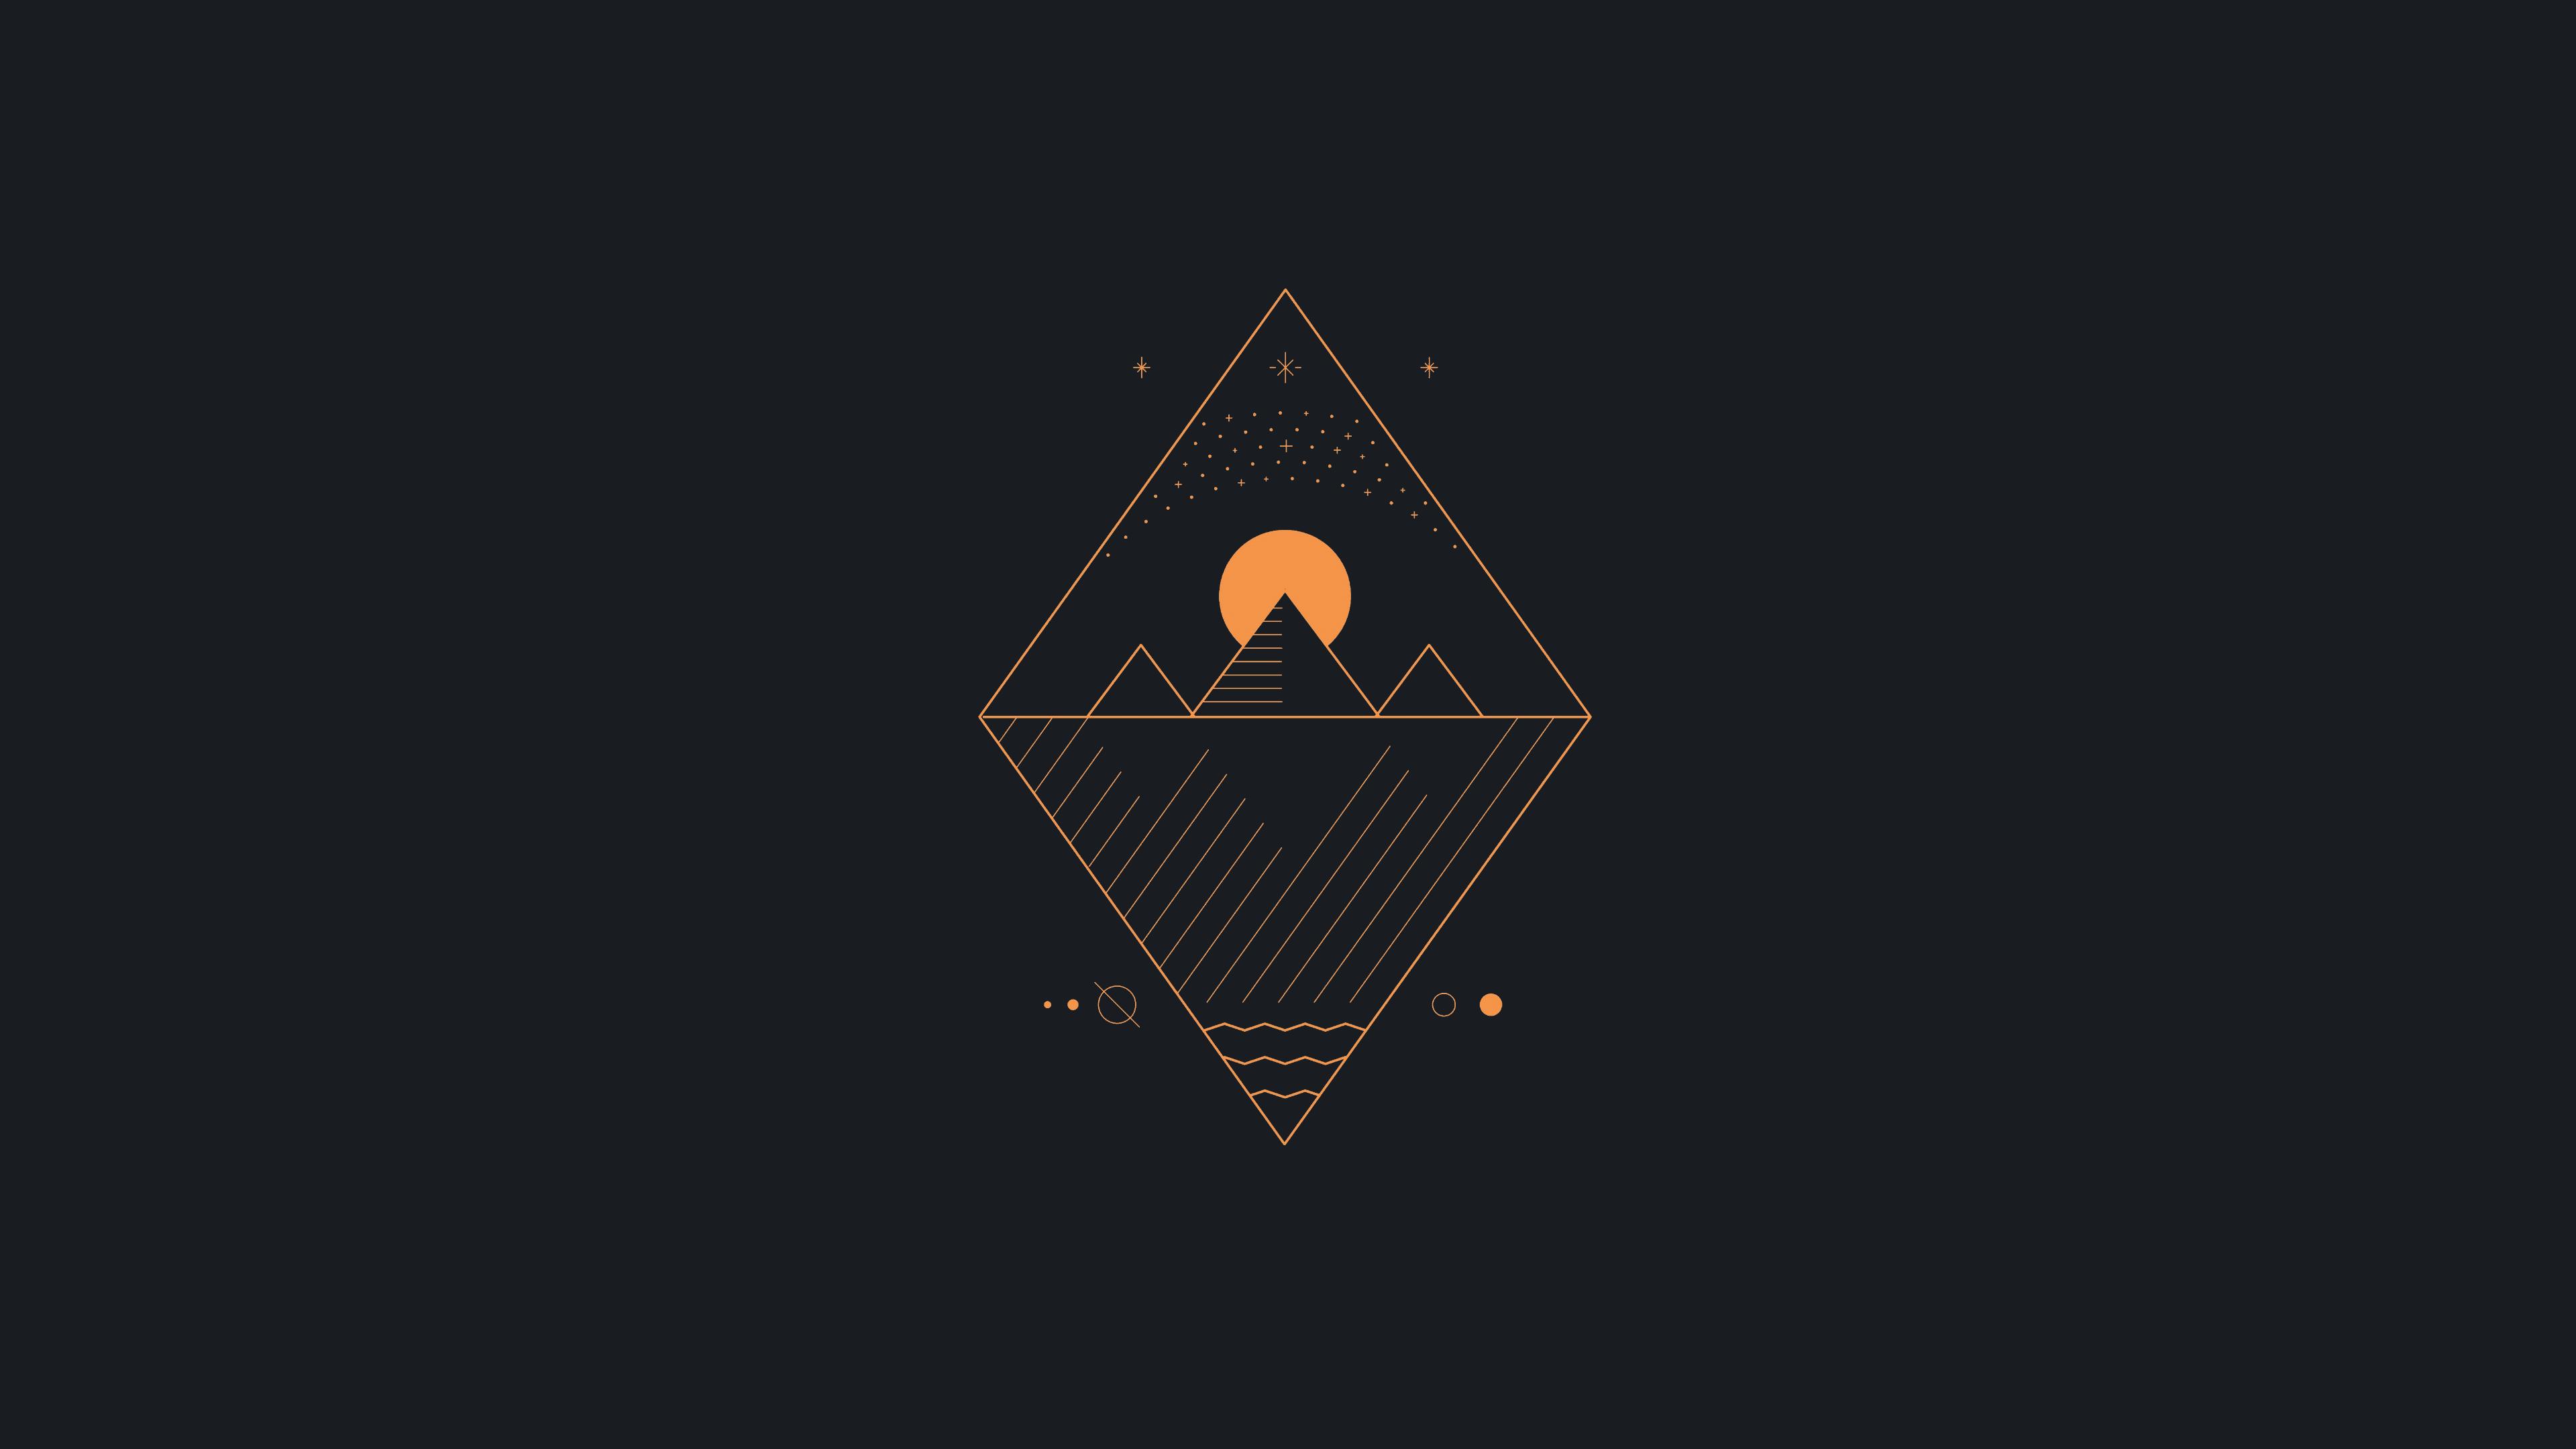 General 3840x2160 abstract minimalism orange simple background simple black background